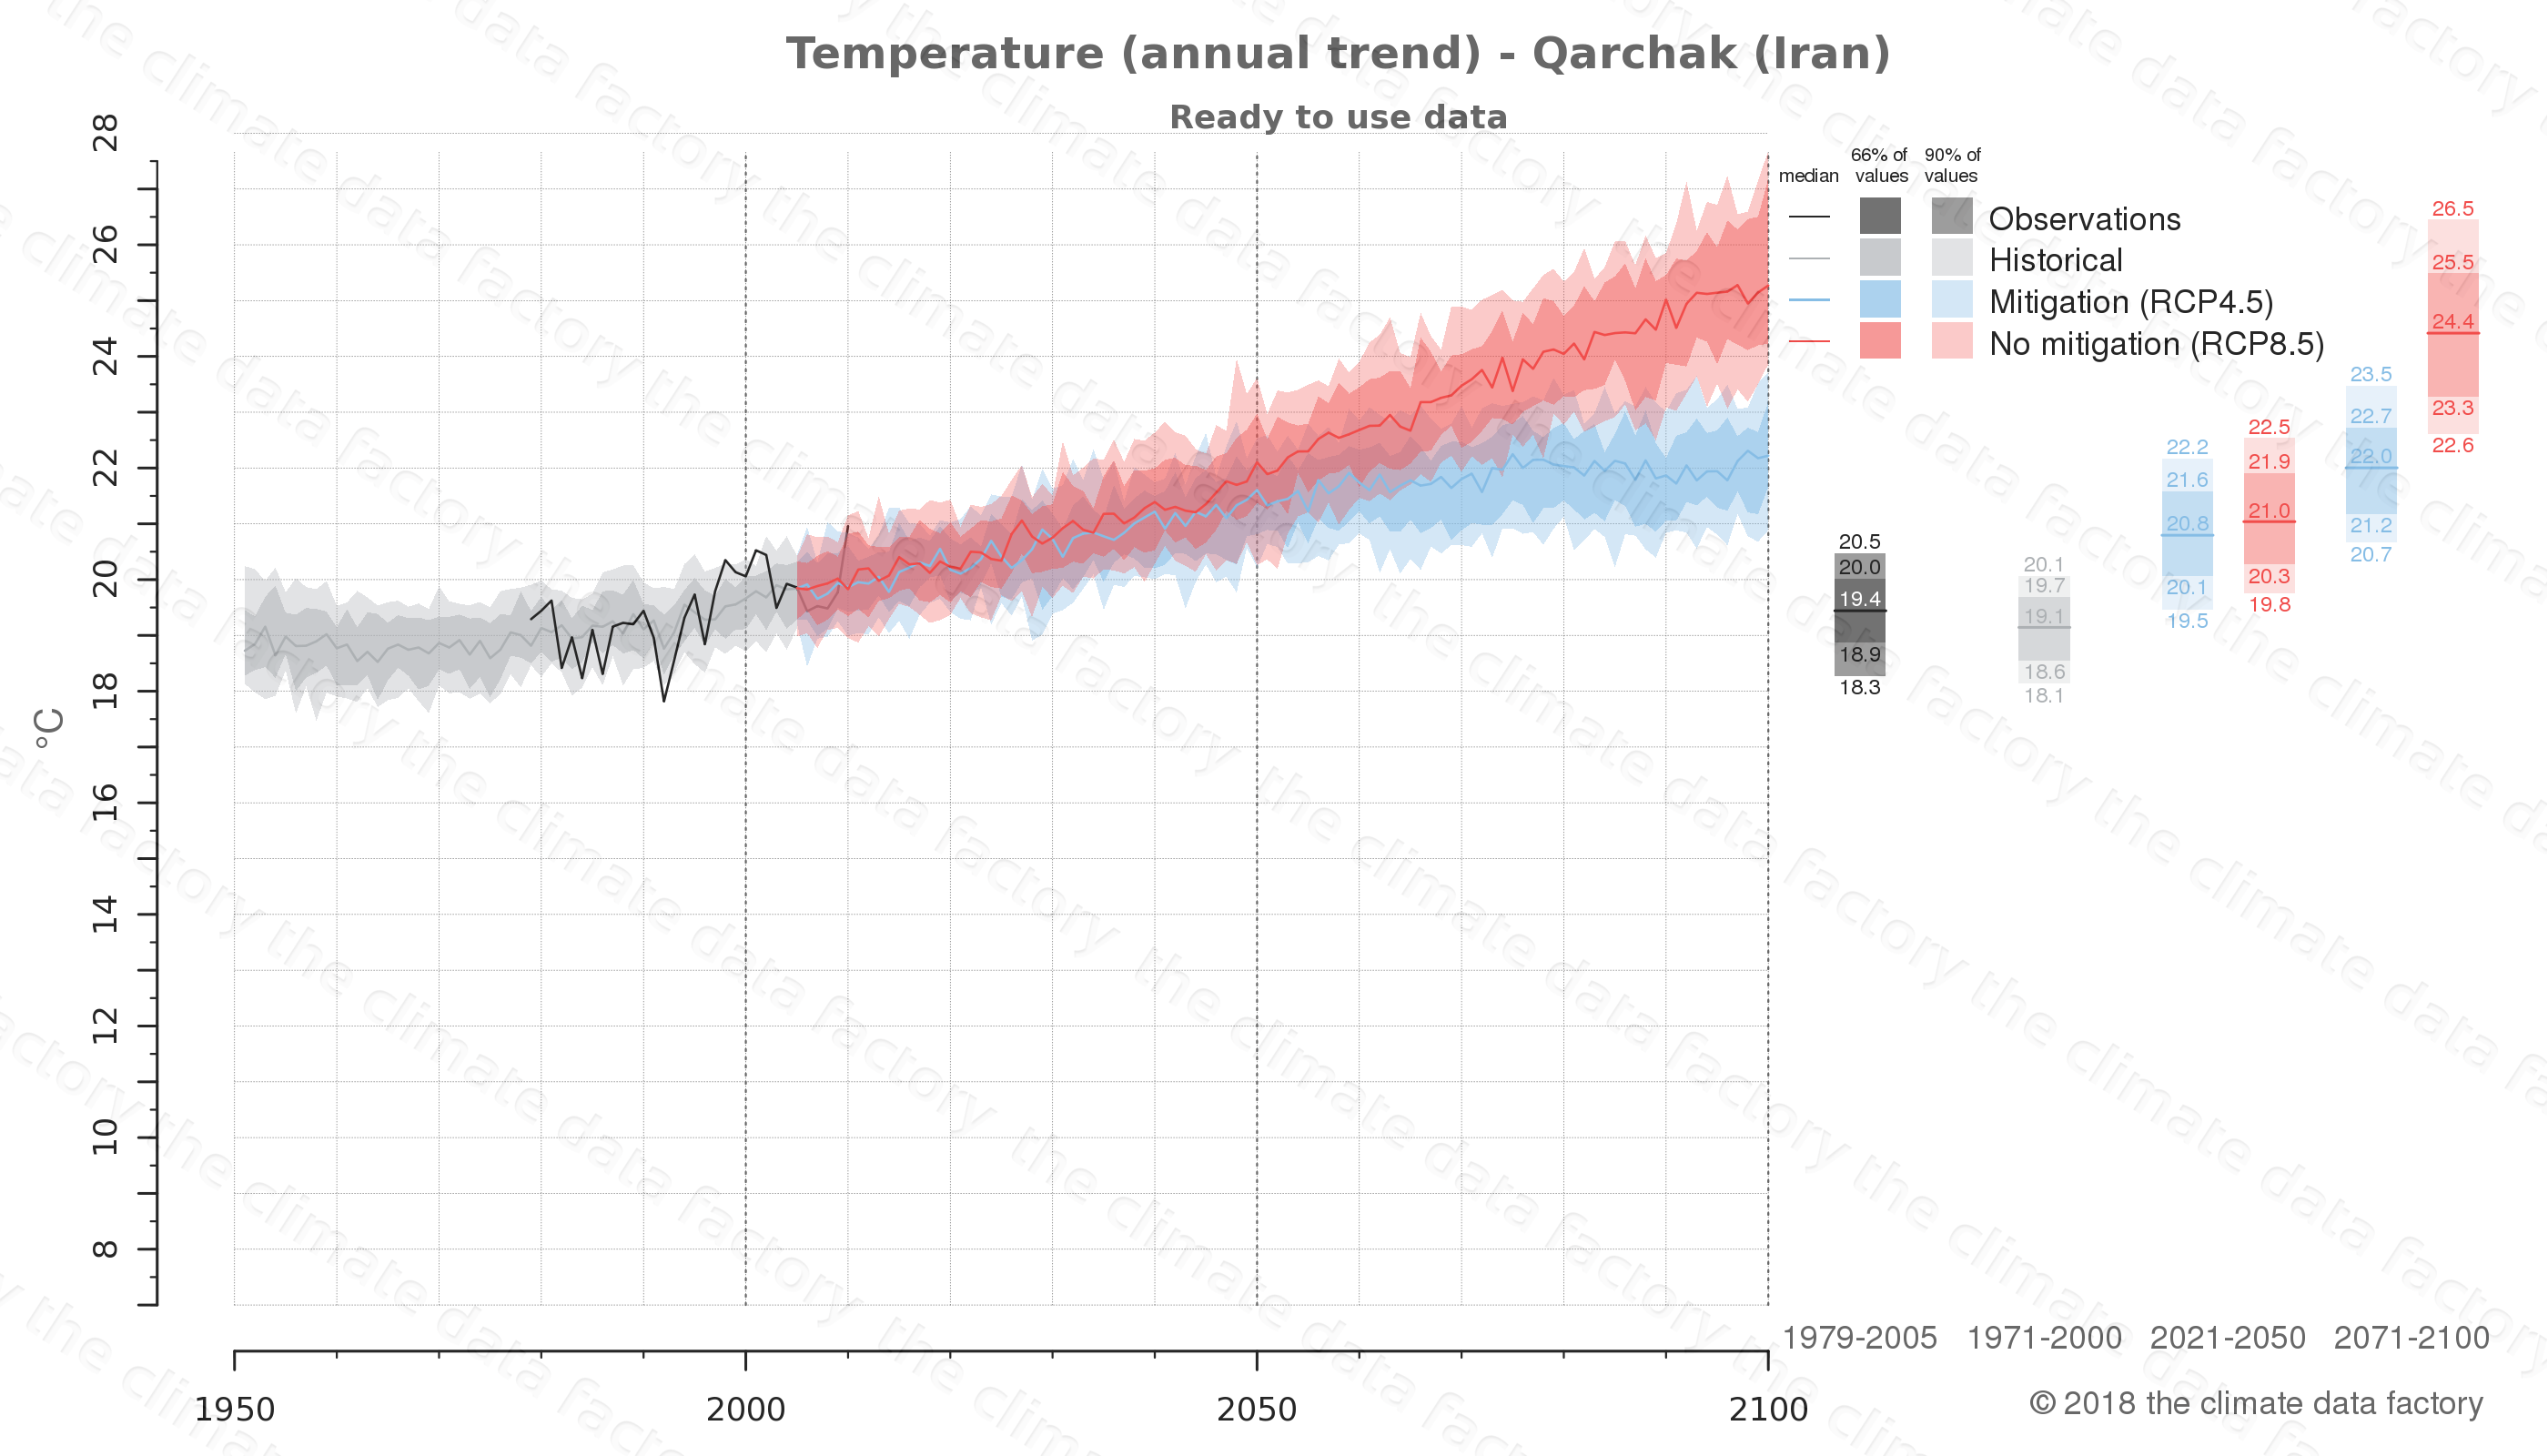 climate change data policy adaptation climate graph city data temperature qarchak iran